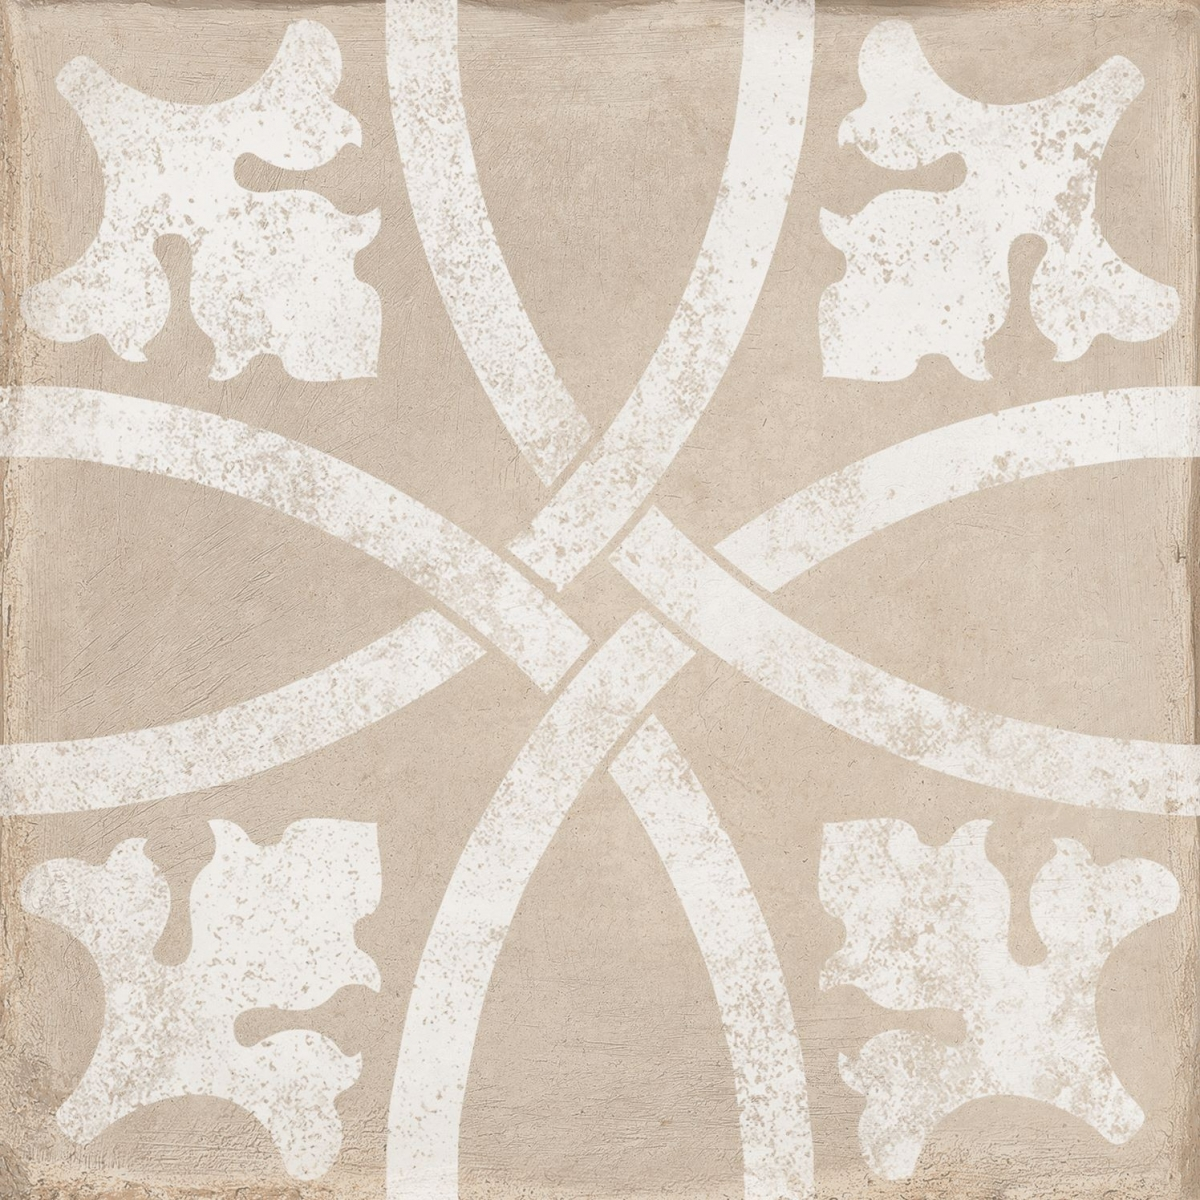 Triana Lace Beige 25x25 (m2) - Serie Triana - Marca Keros Cerámica